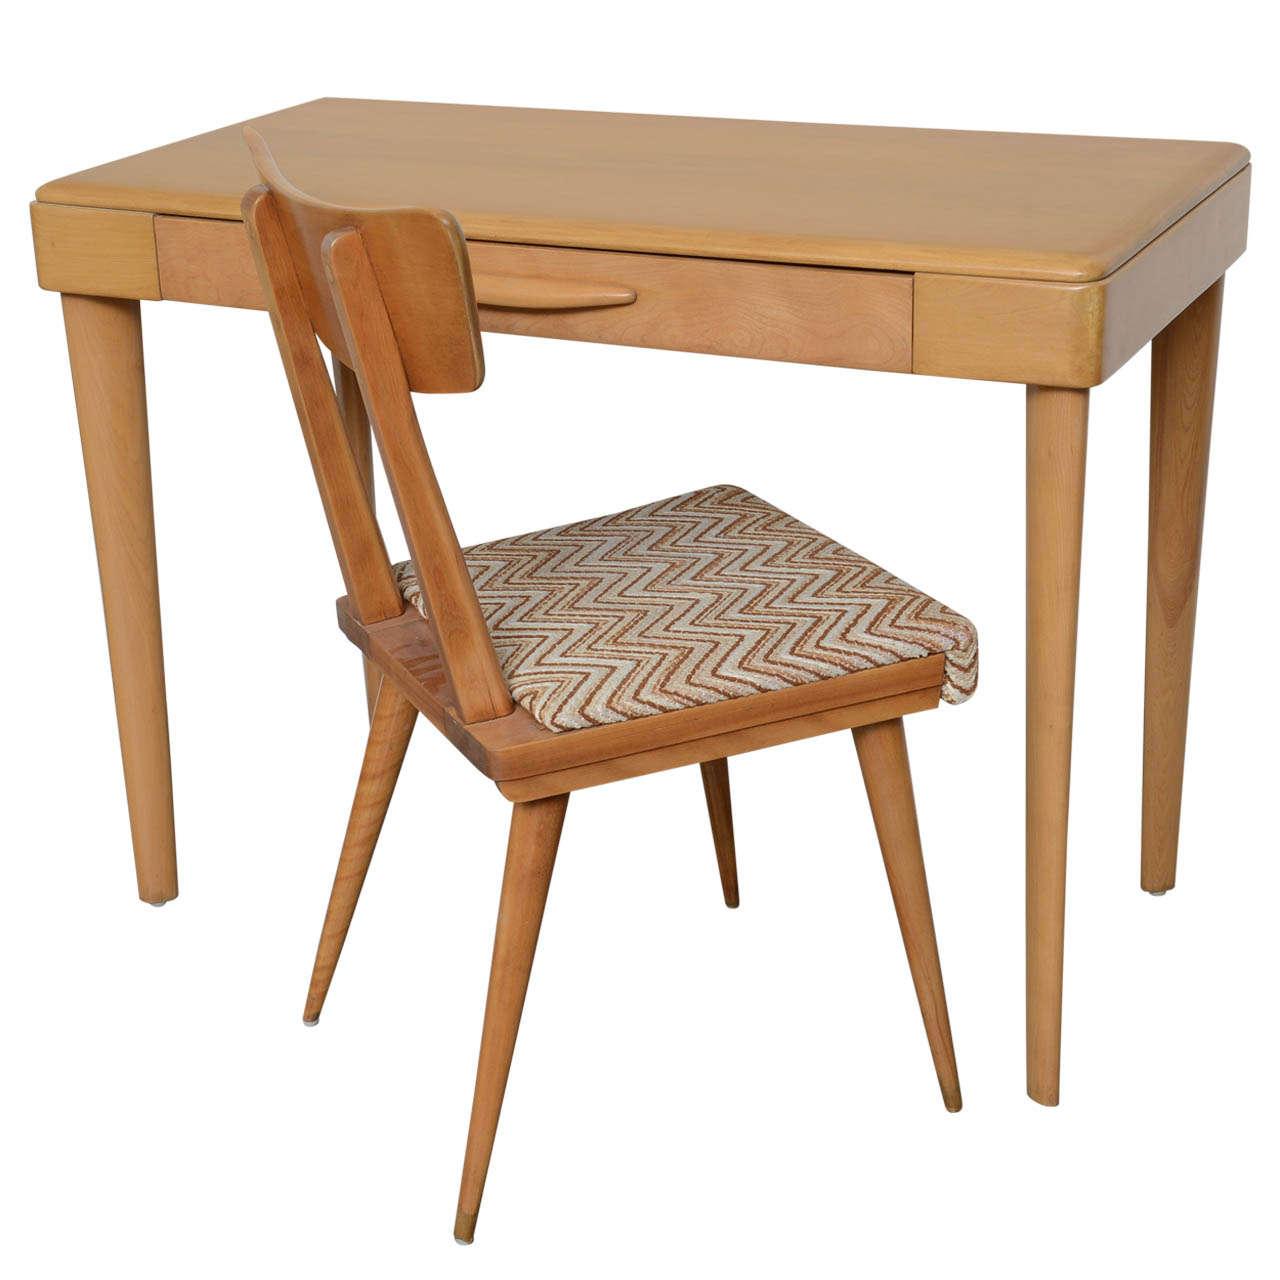 Heywood Wakefield Maple Desk 1960s  Chair Sold Desk Comes Solo 1